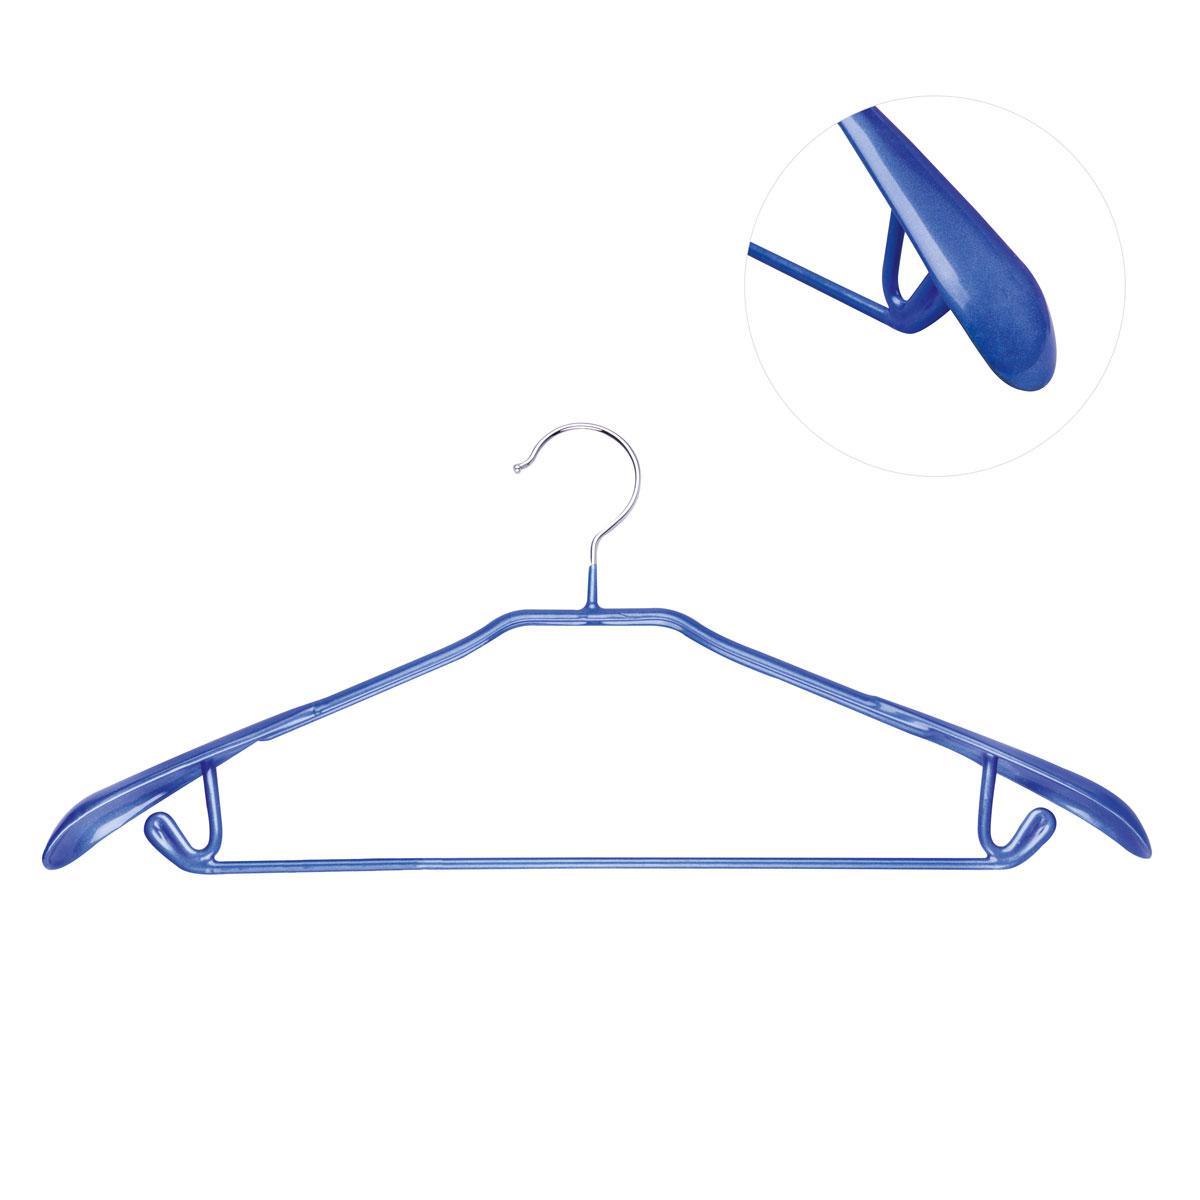 Вешалка для брюк Miolla, цвет: синий, длина 43 см